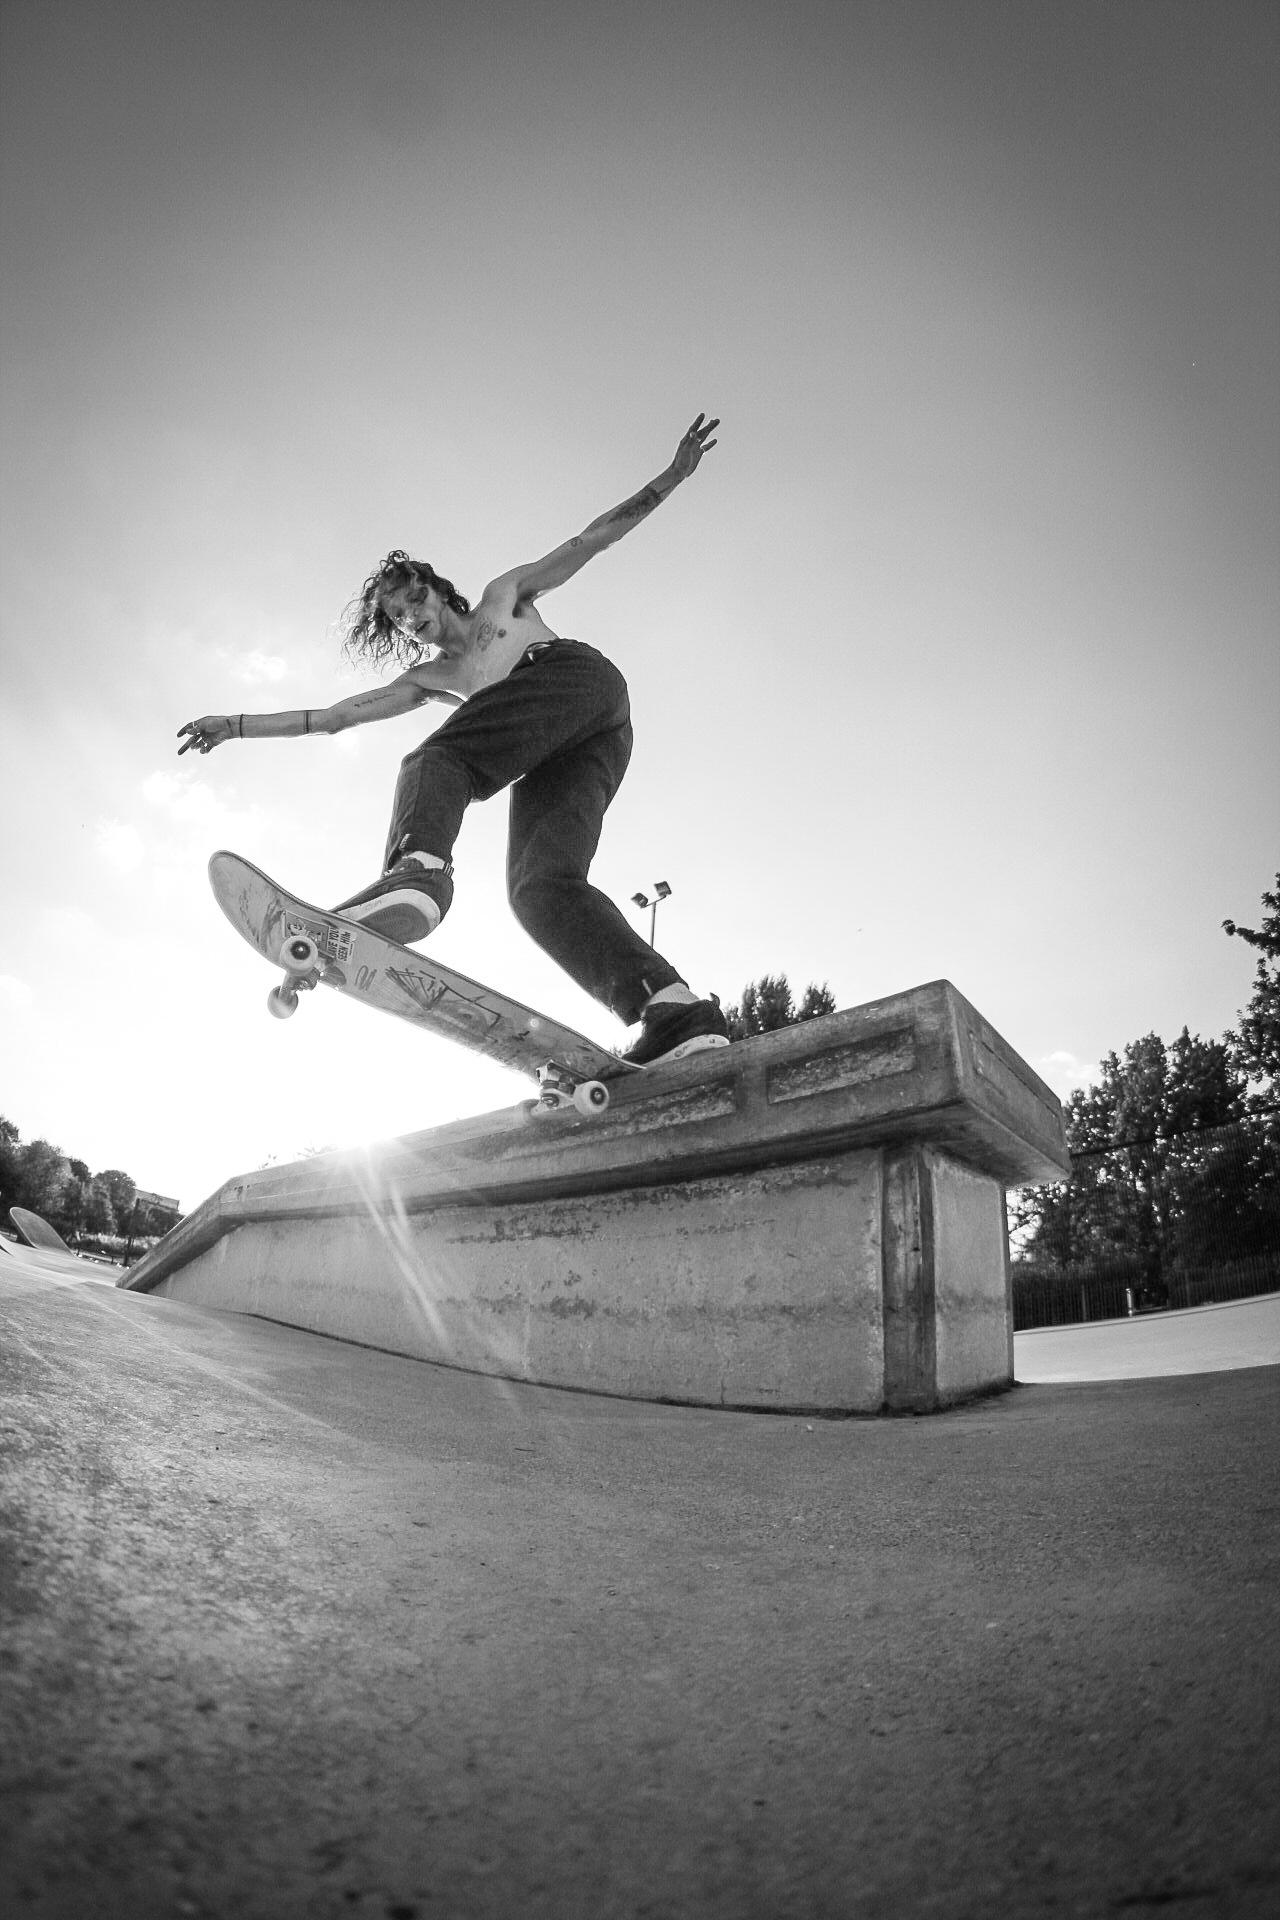 slide on by Dan whitney